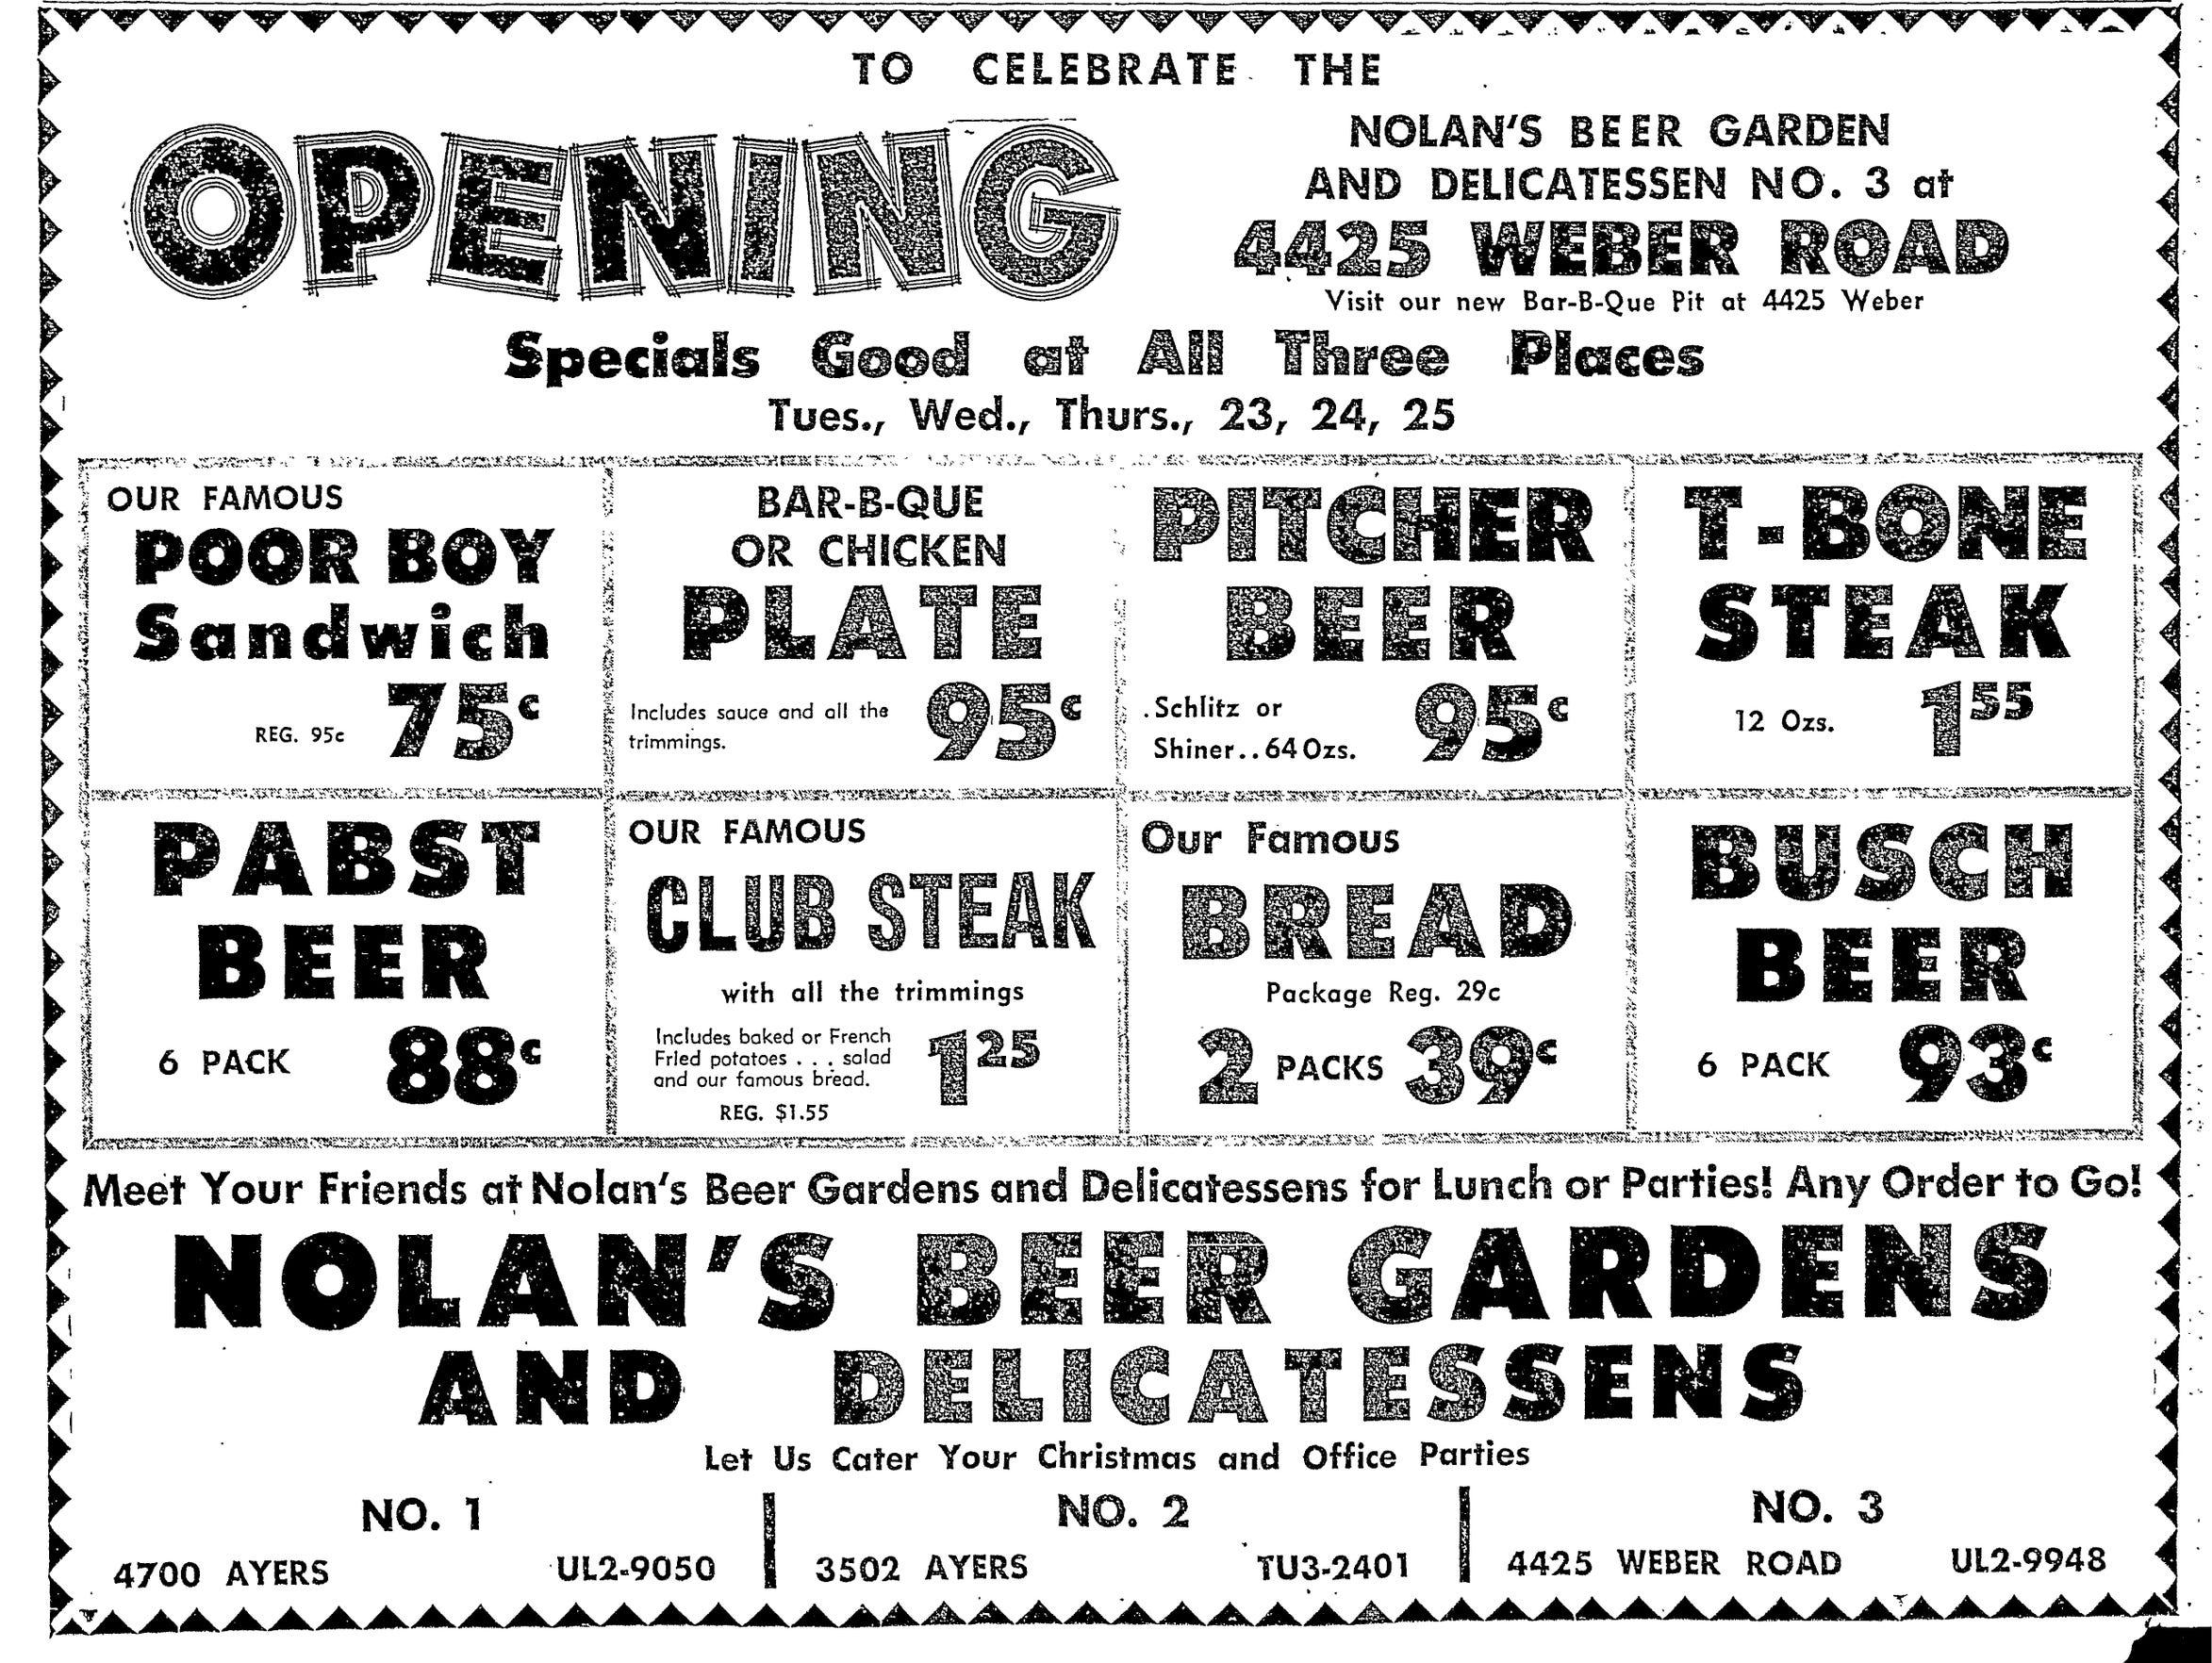 Nolan's Beer Garden and Delicatessen celebrated its third location opening on Weber Road in October 1962.